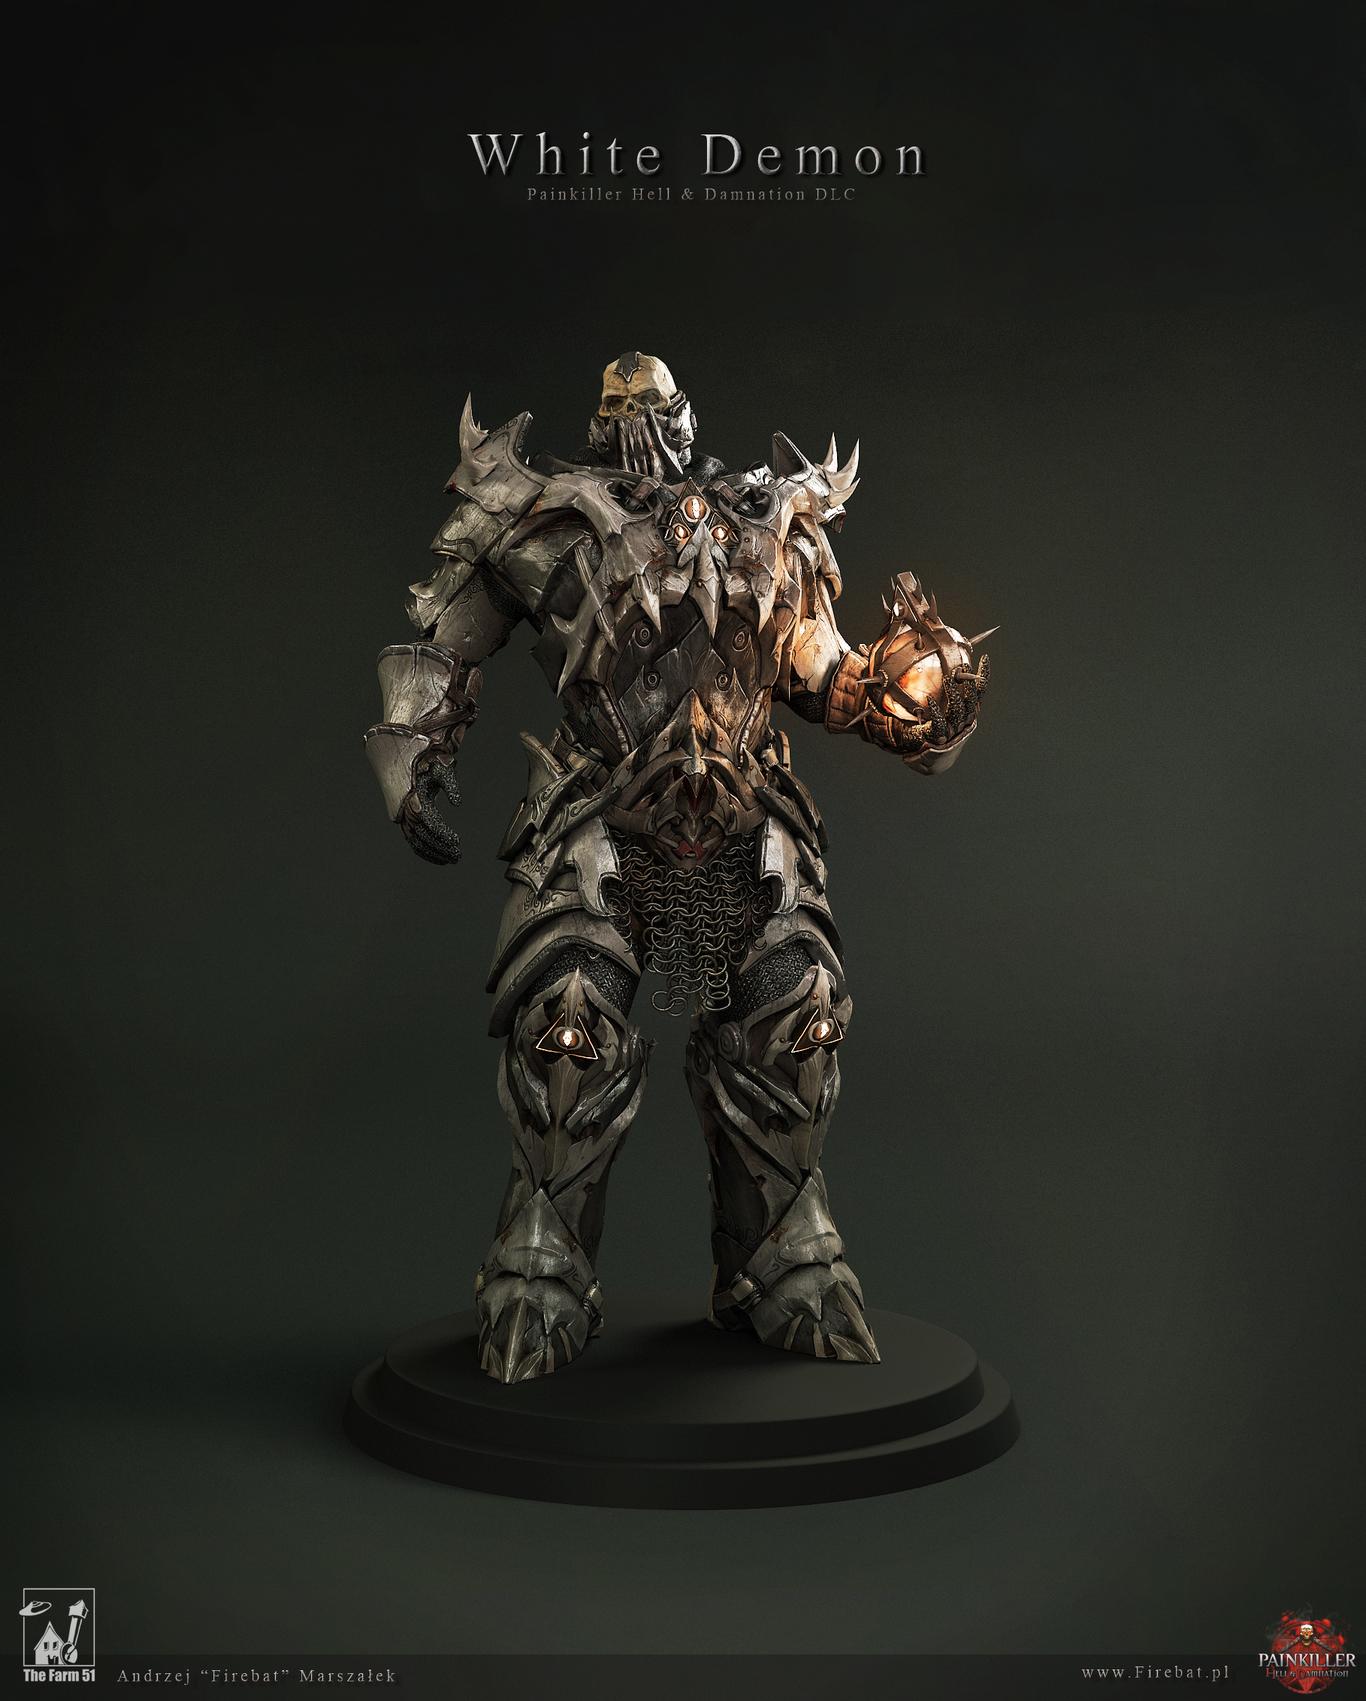 Firebatfx white demon 1 796e421a gngc